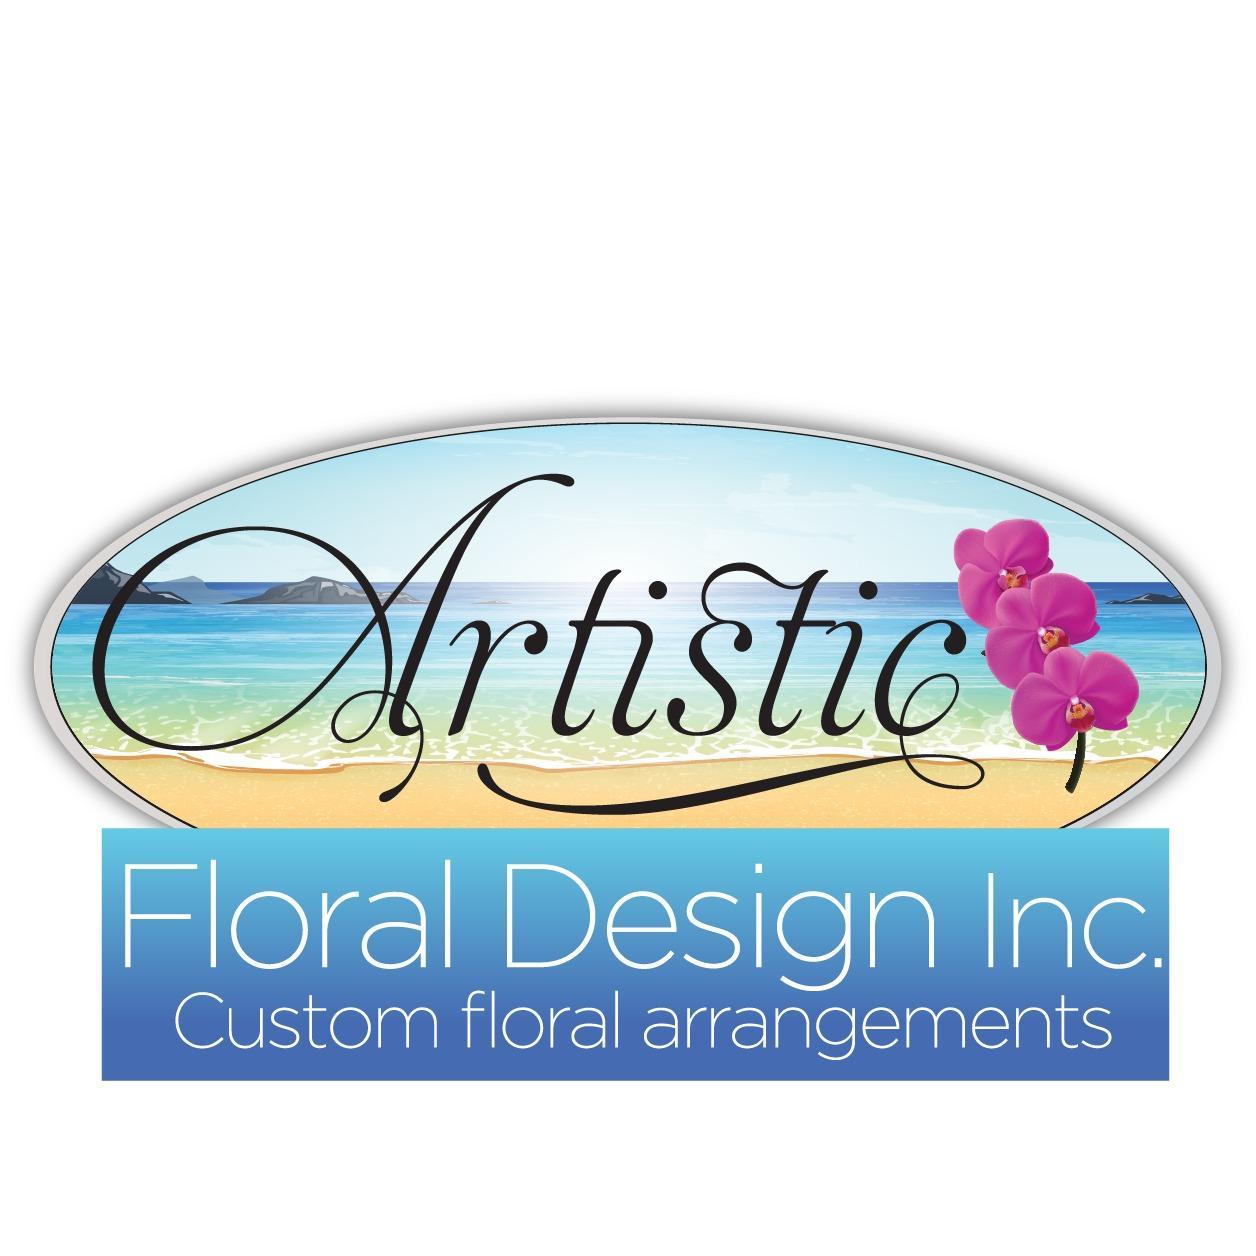 Artistic Floral Design, Inc.